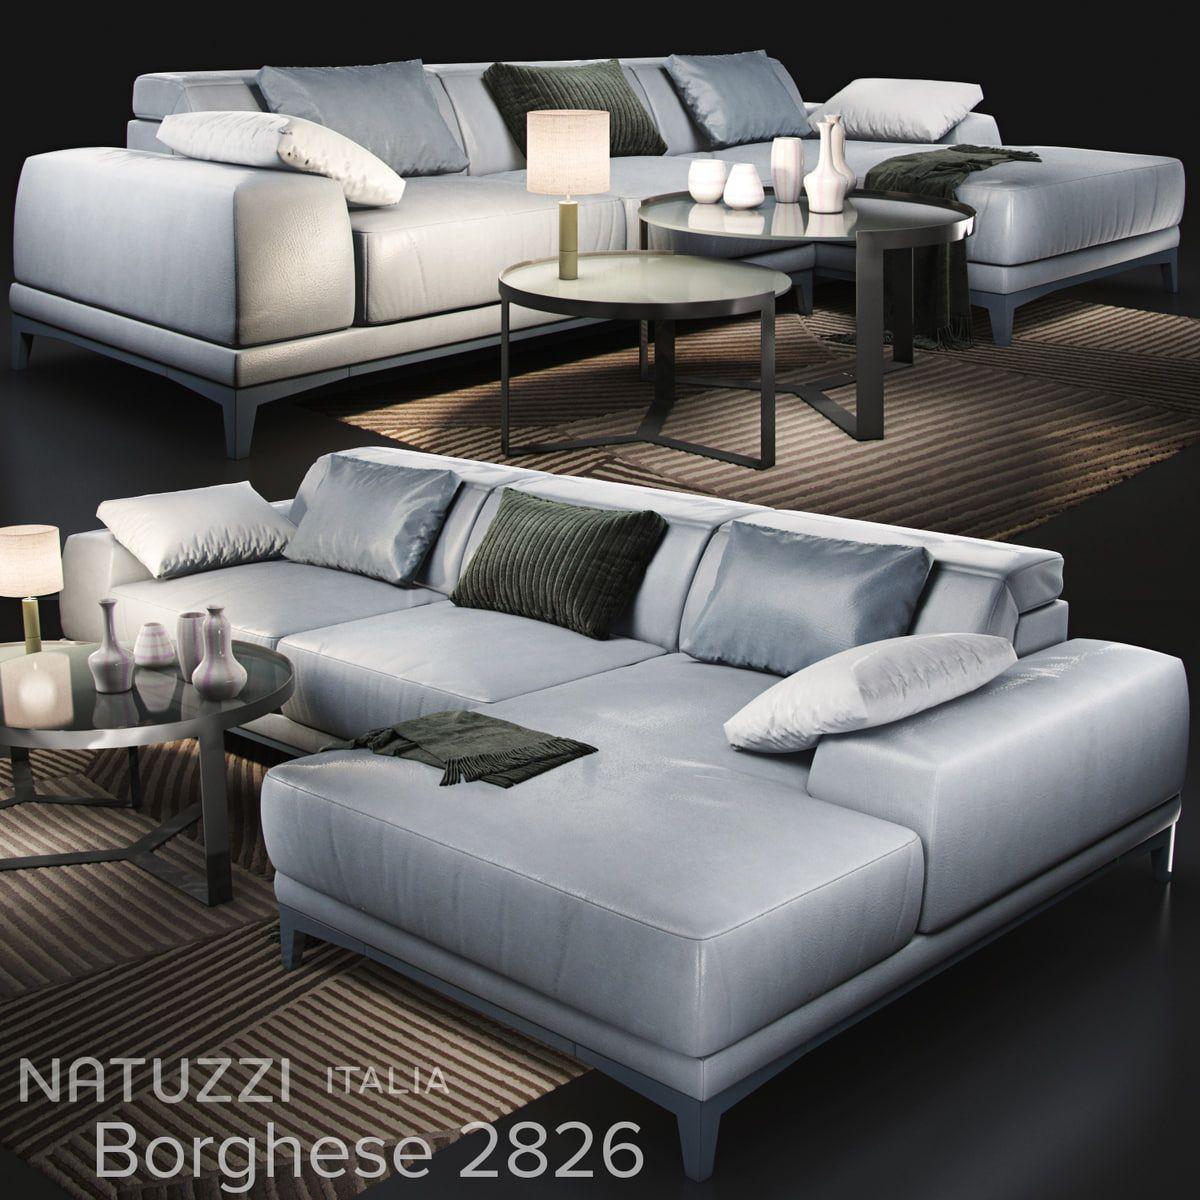 Sofa Natuzzi Borghese 2826 3d Model 3d Model Sofa Living Room Decor Modern Natuzzi